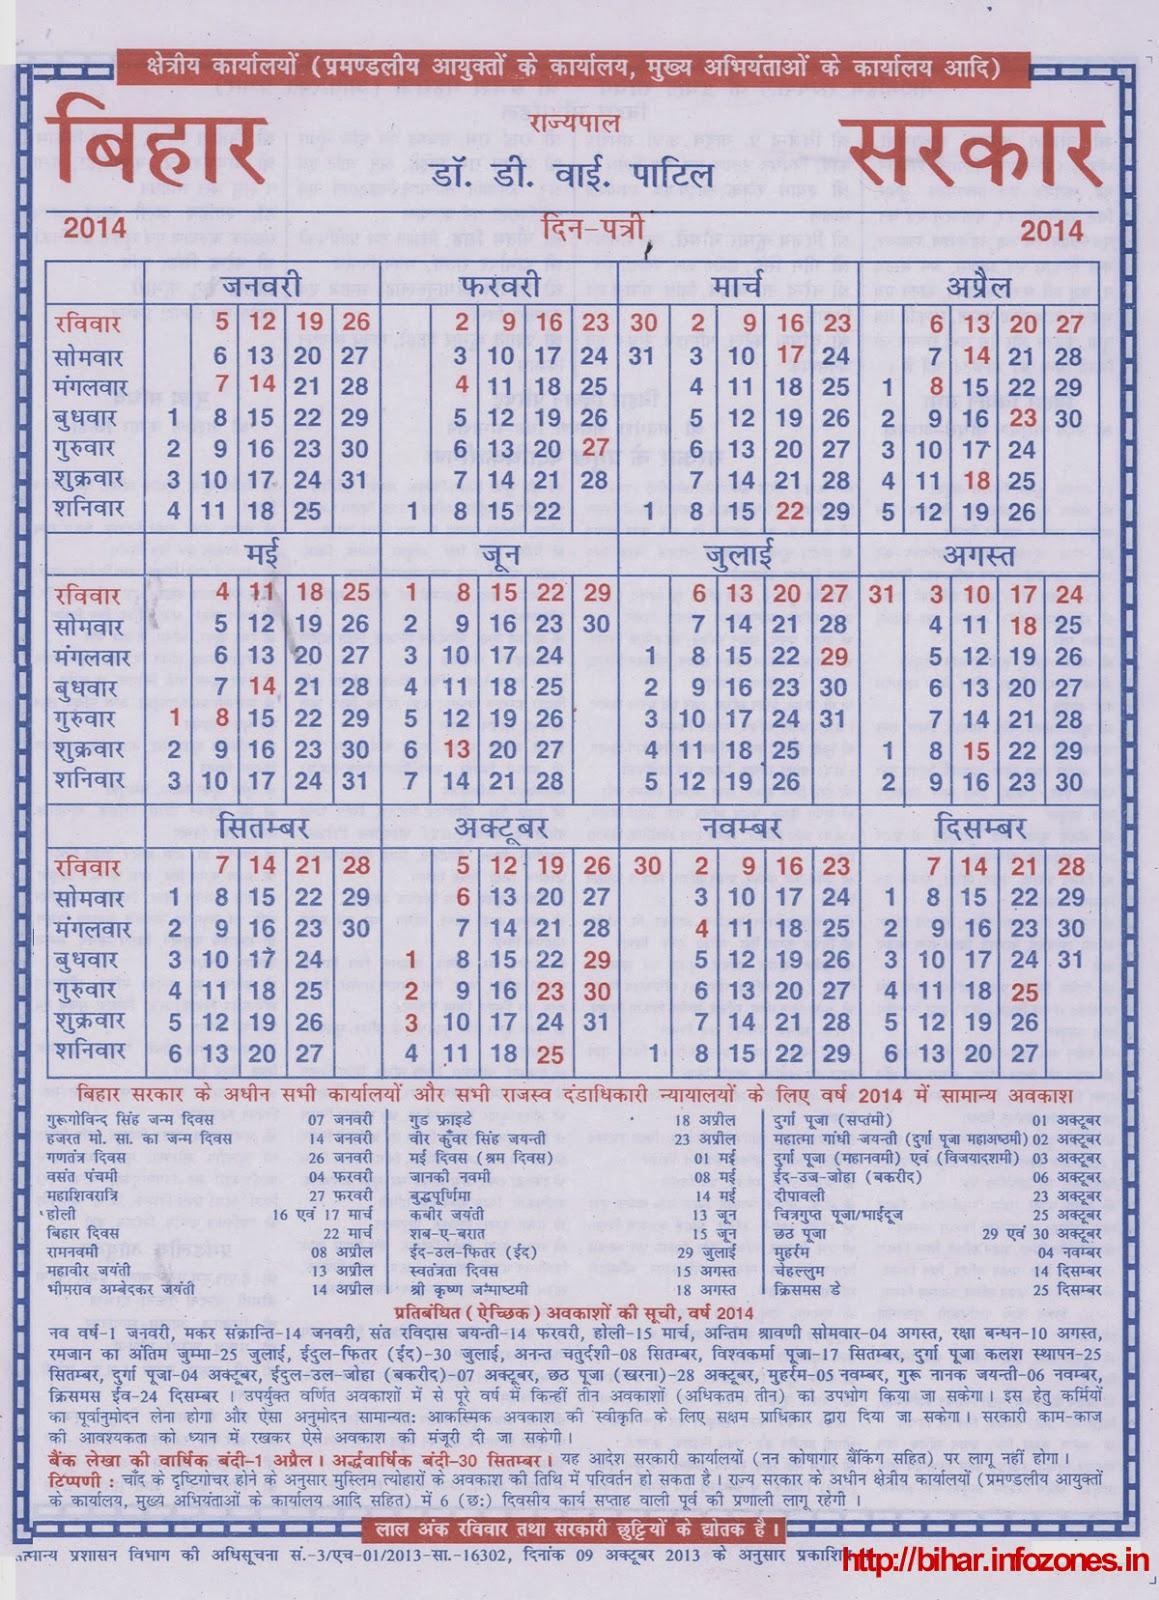 Bihar Govt. Calendar | Calendar For Planning with Bihar Govt Calander